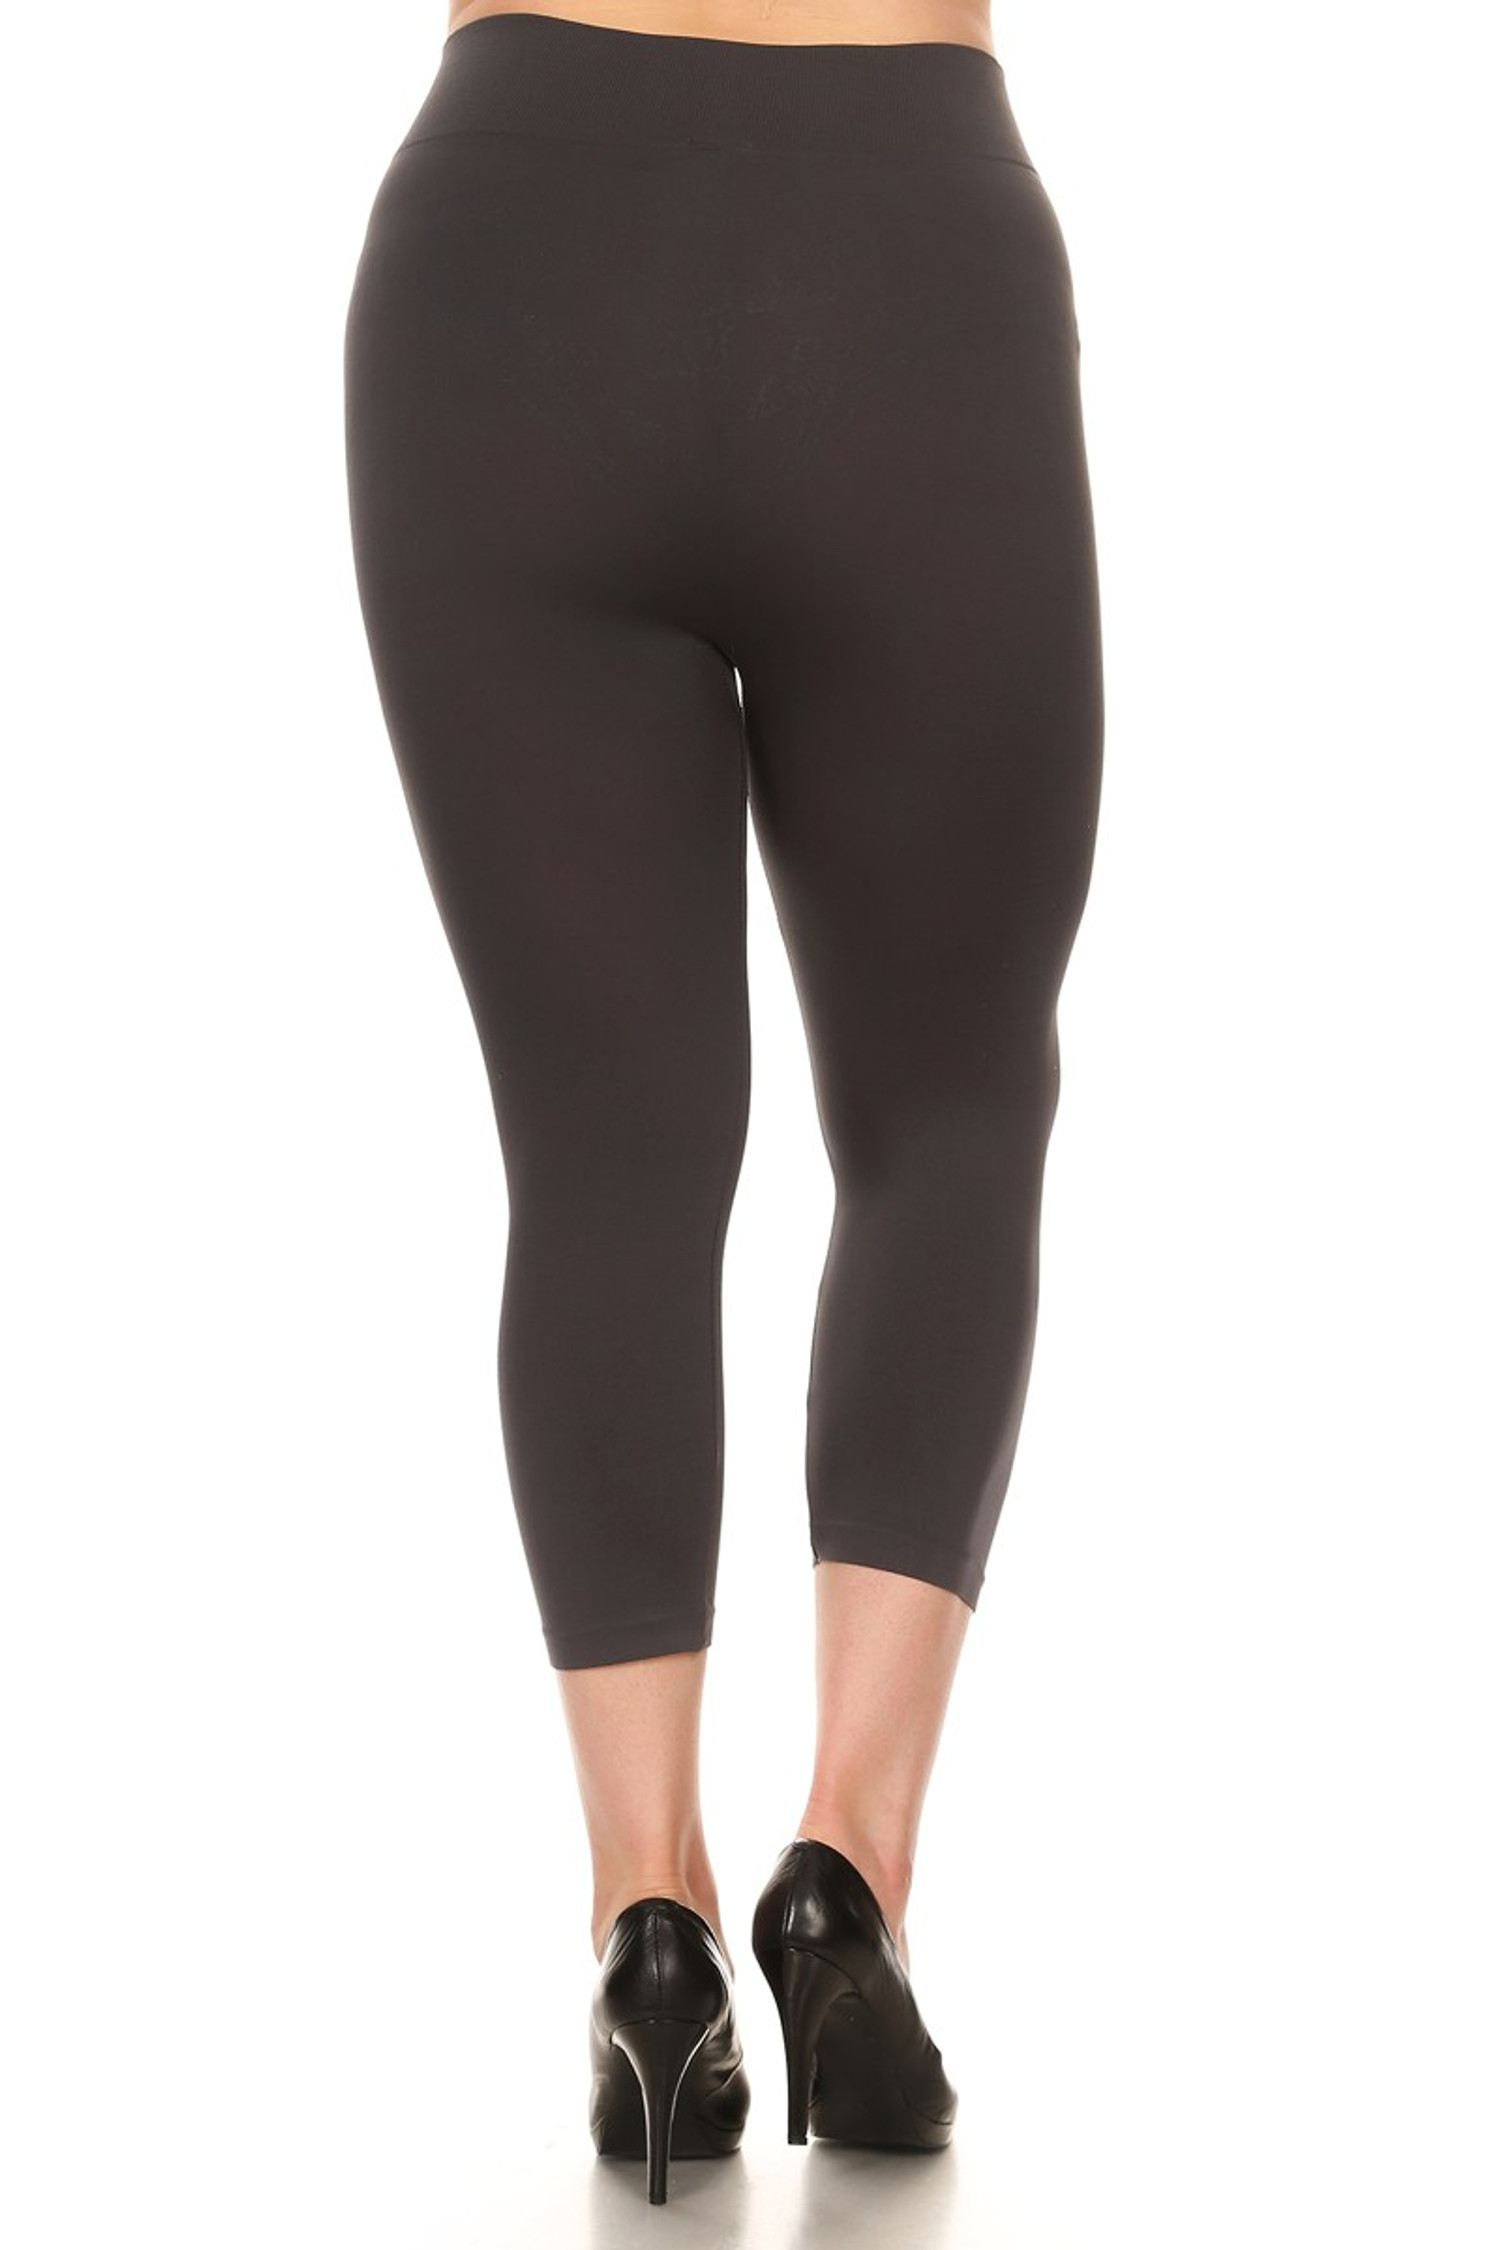 Charcoal Basic Spandex Capri Plus Size Leggings